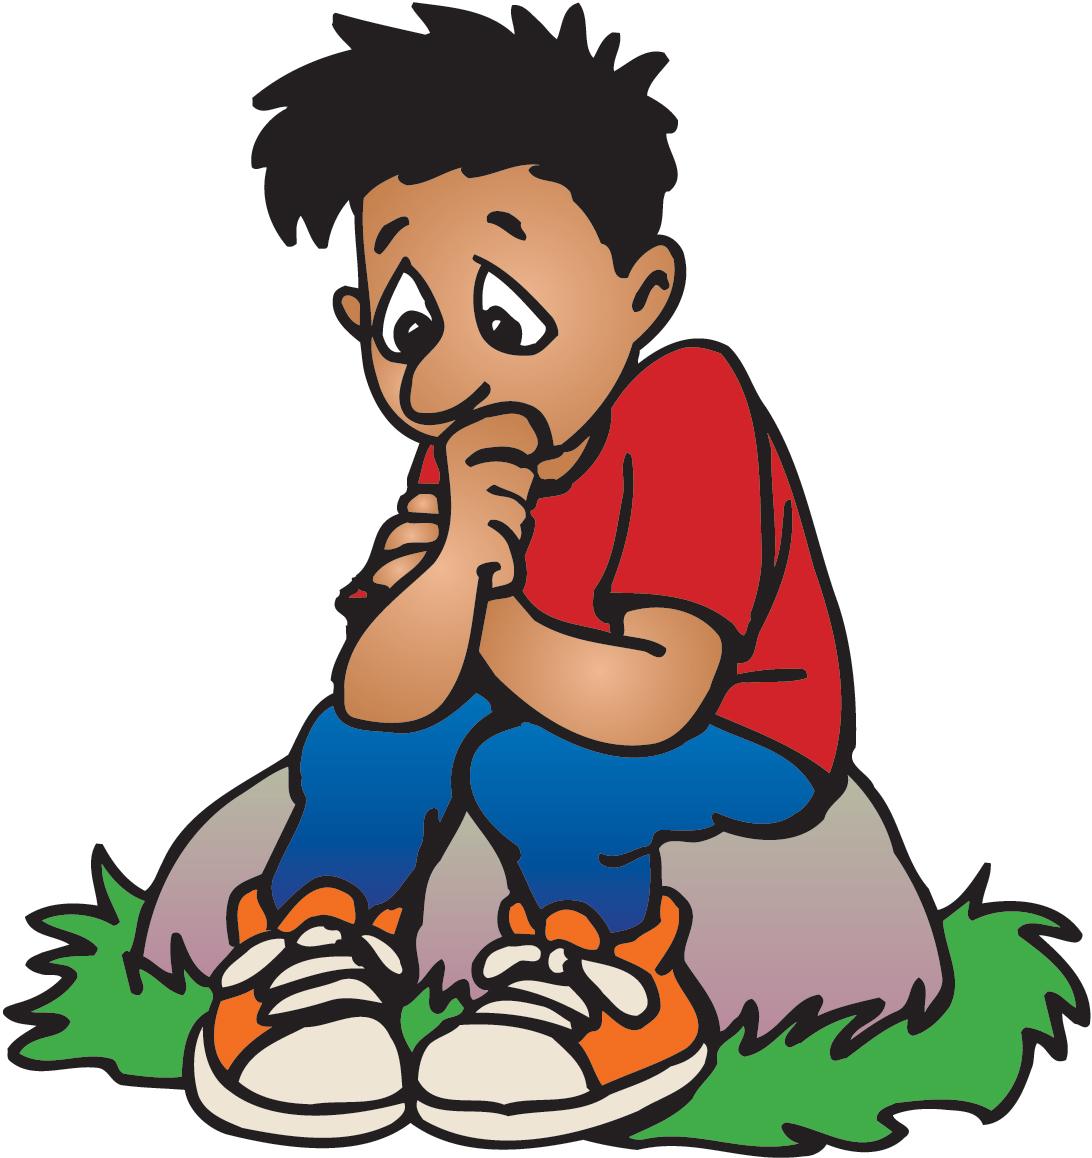 Worried Cartoon Boy Clipart - Clipart Kid